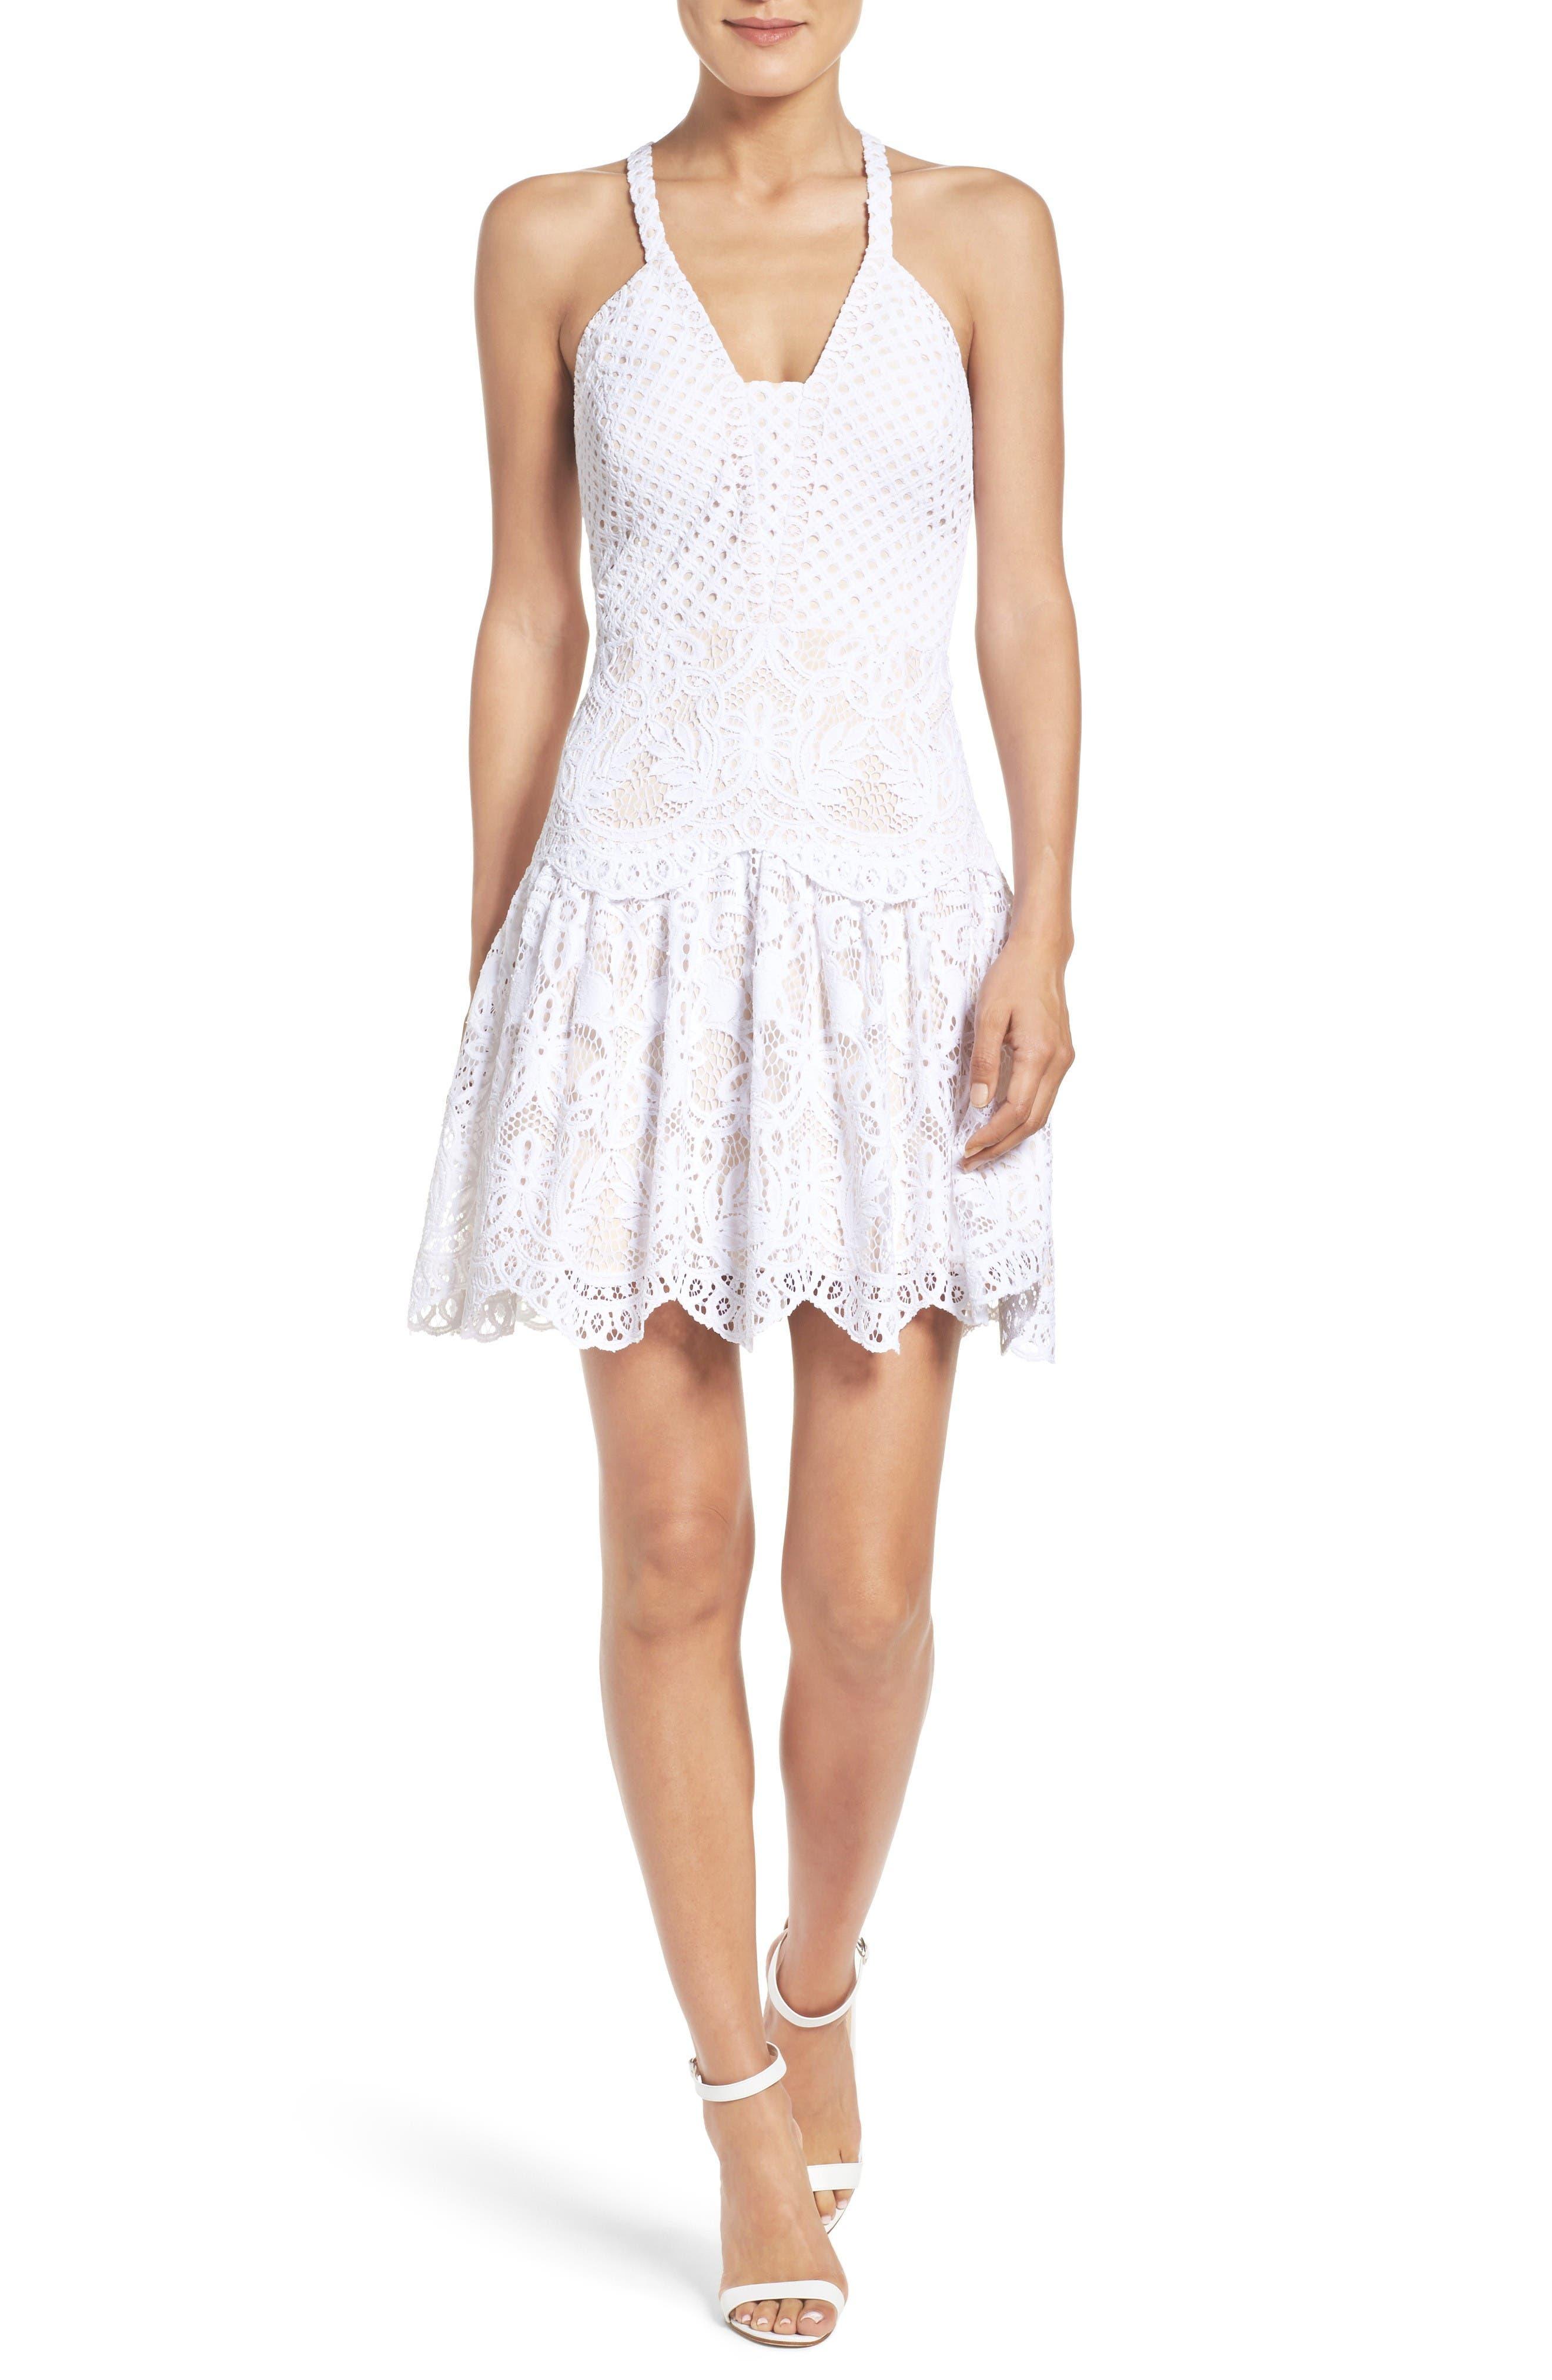 Adella Lace Dress,                             Alternate thumbnail 4, color,                             Resort White